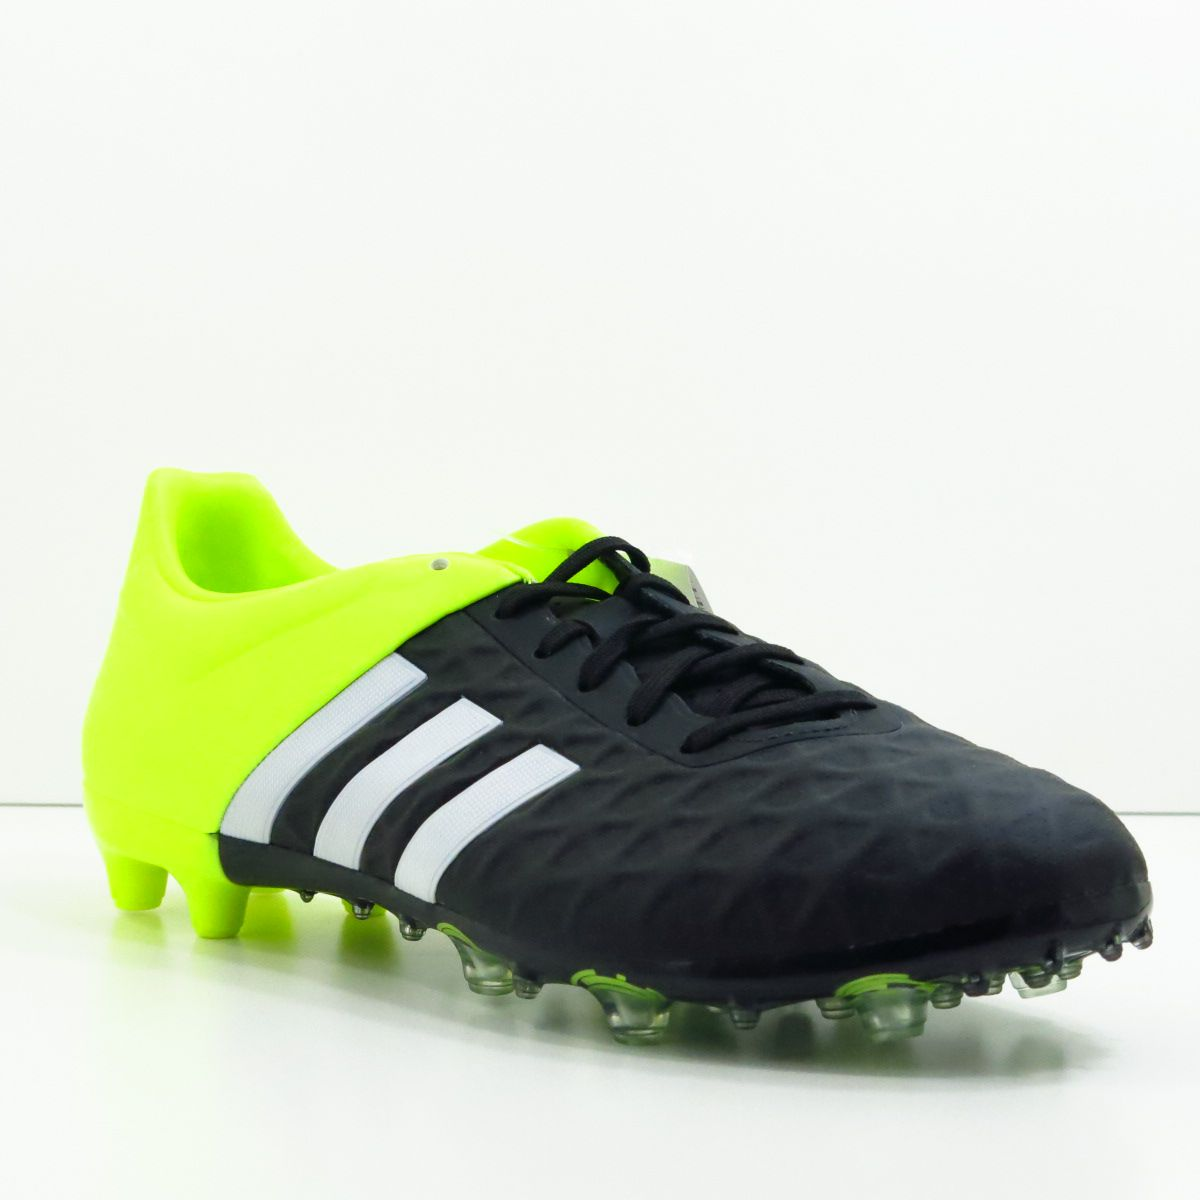 Chuteira Adidas Ace 15.2 FG